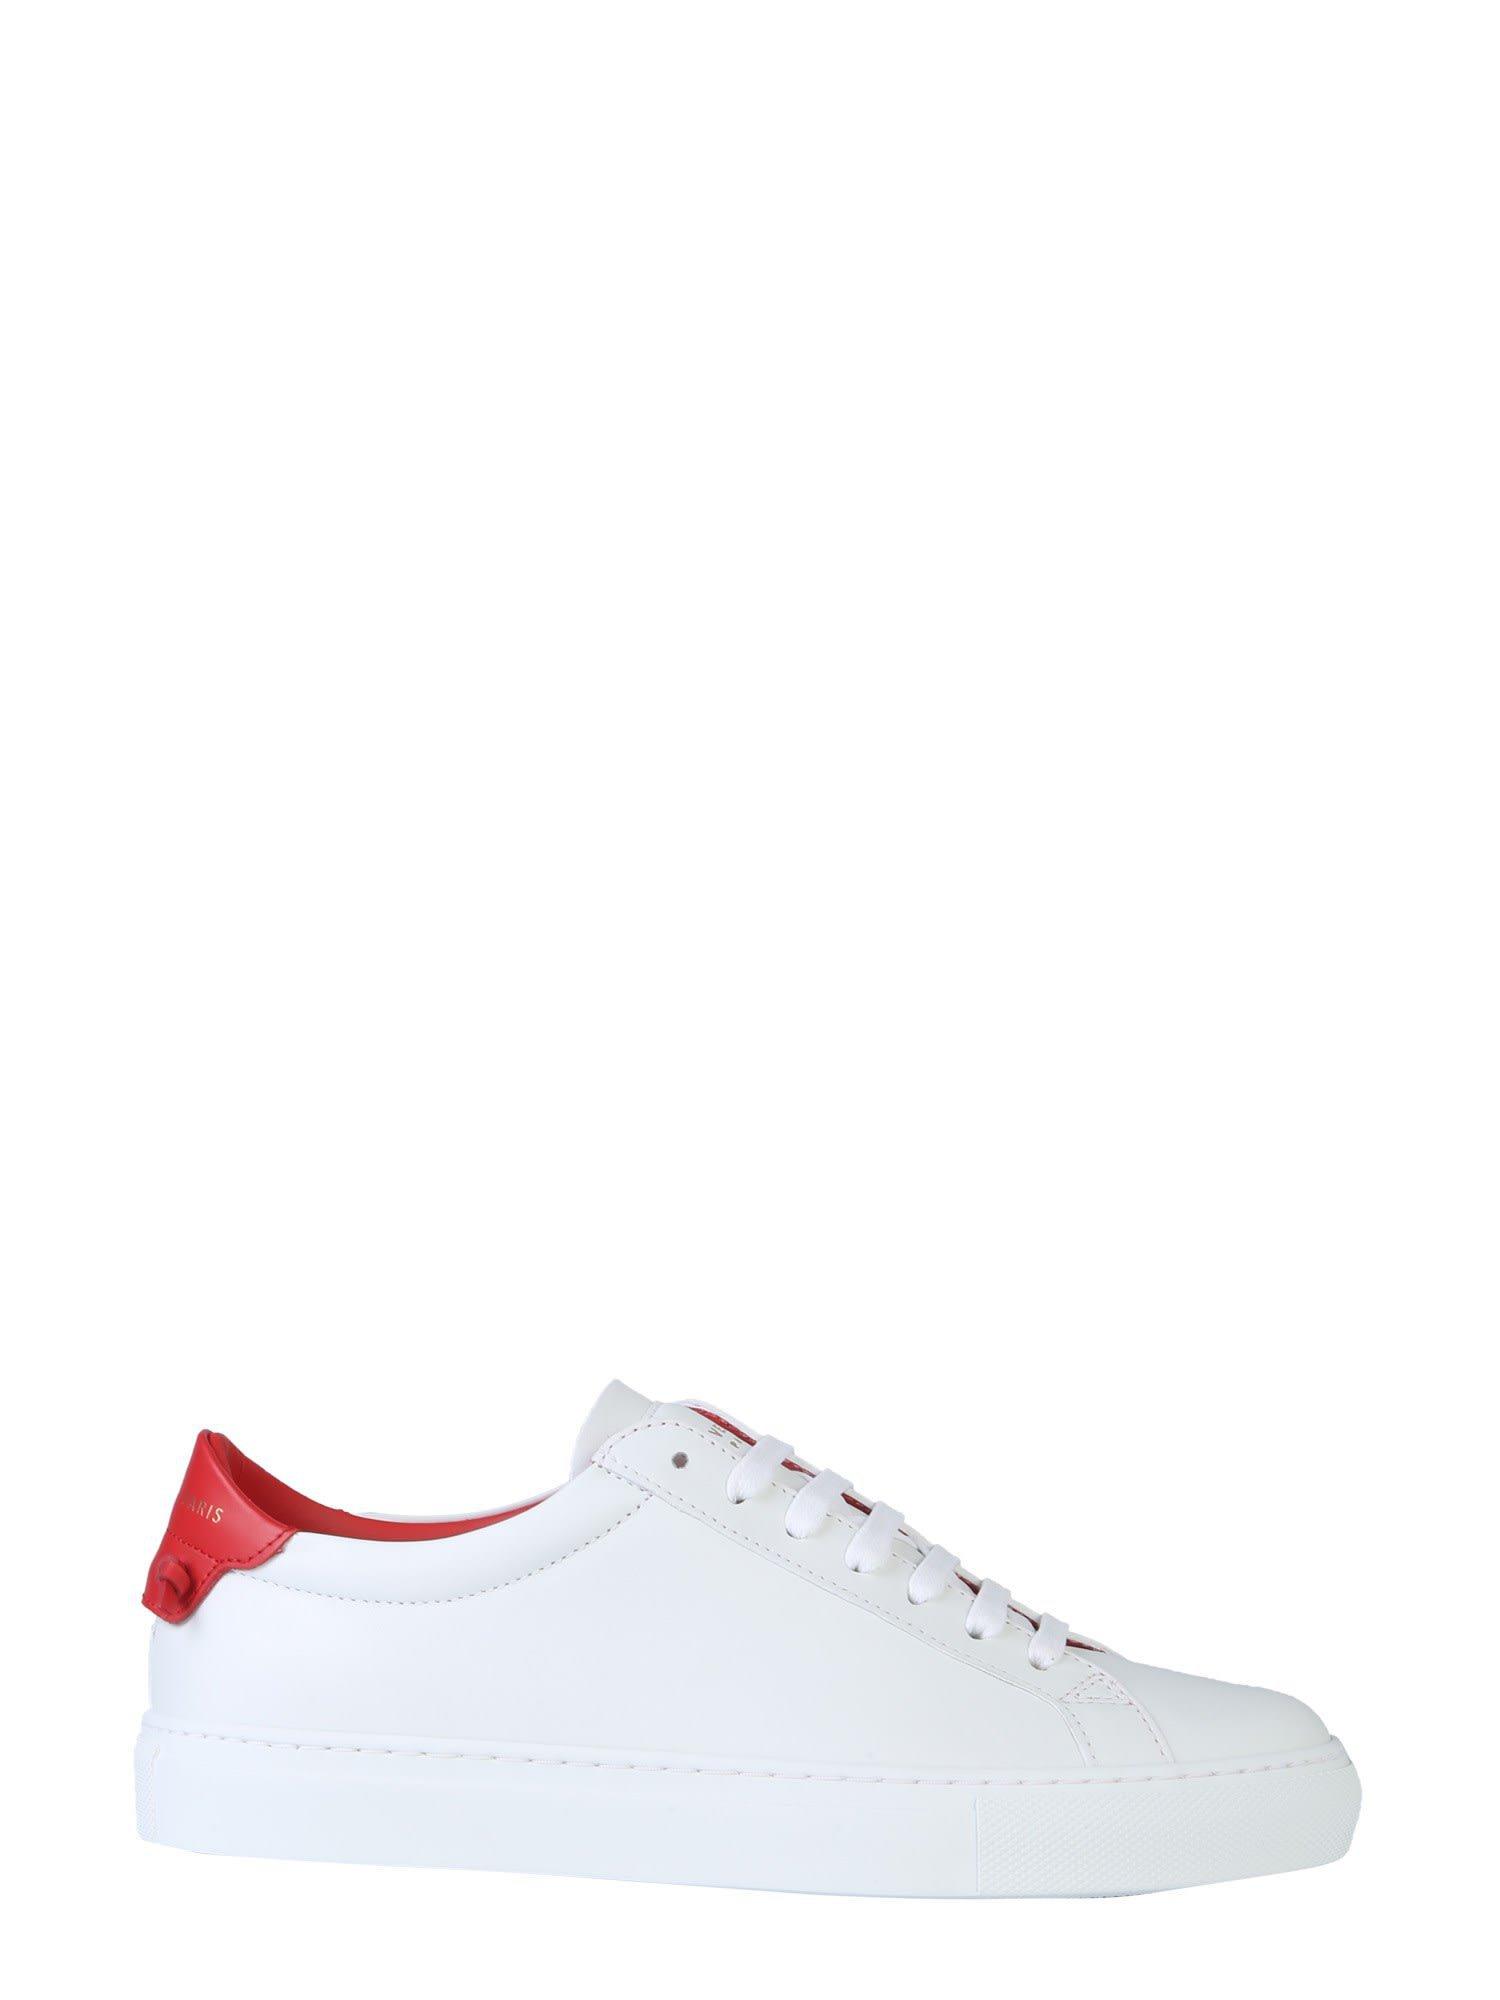 Givenchy Urban Street Sneaker